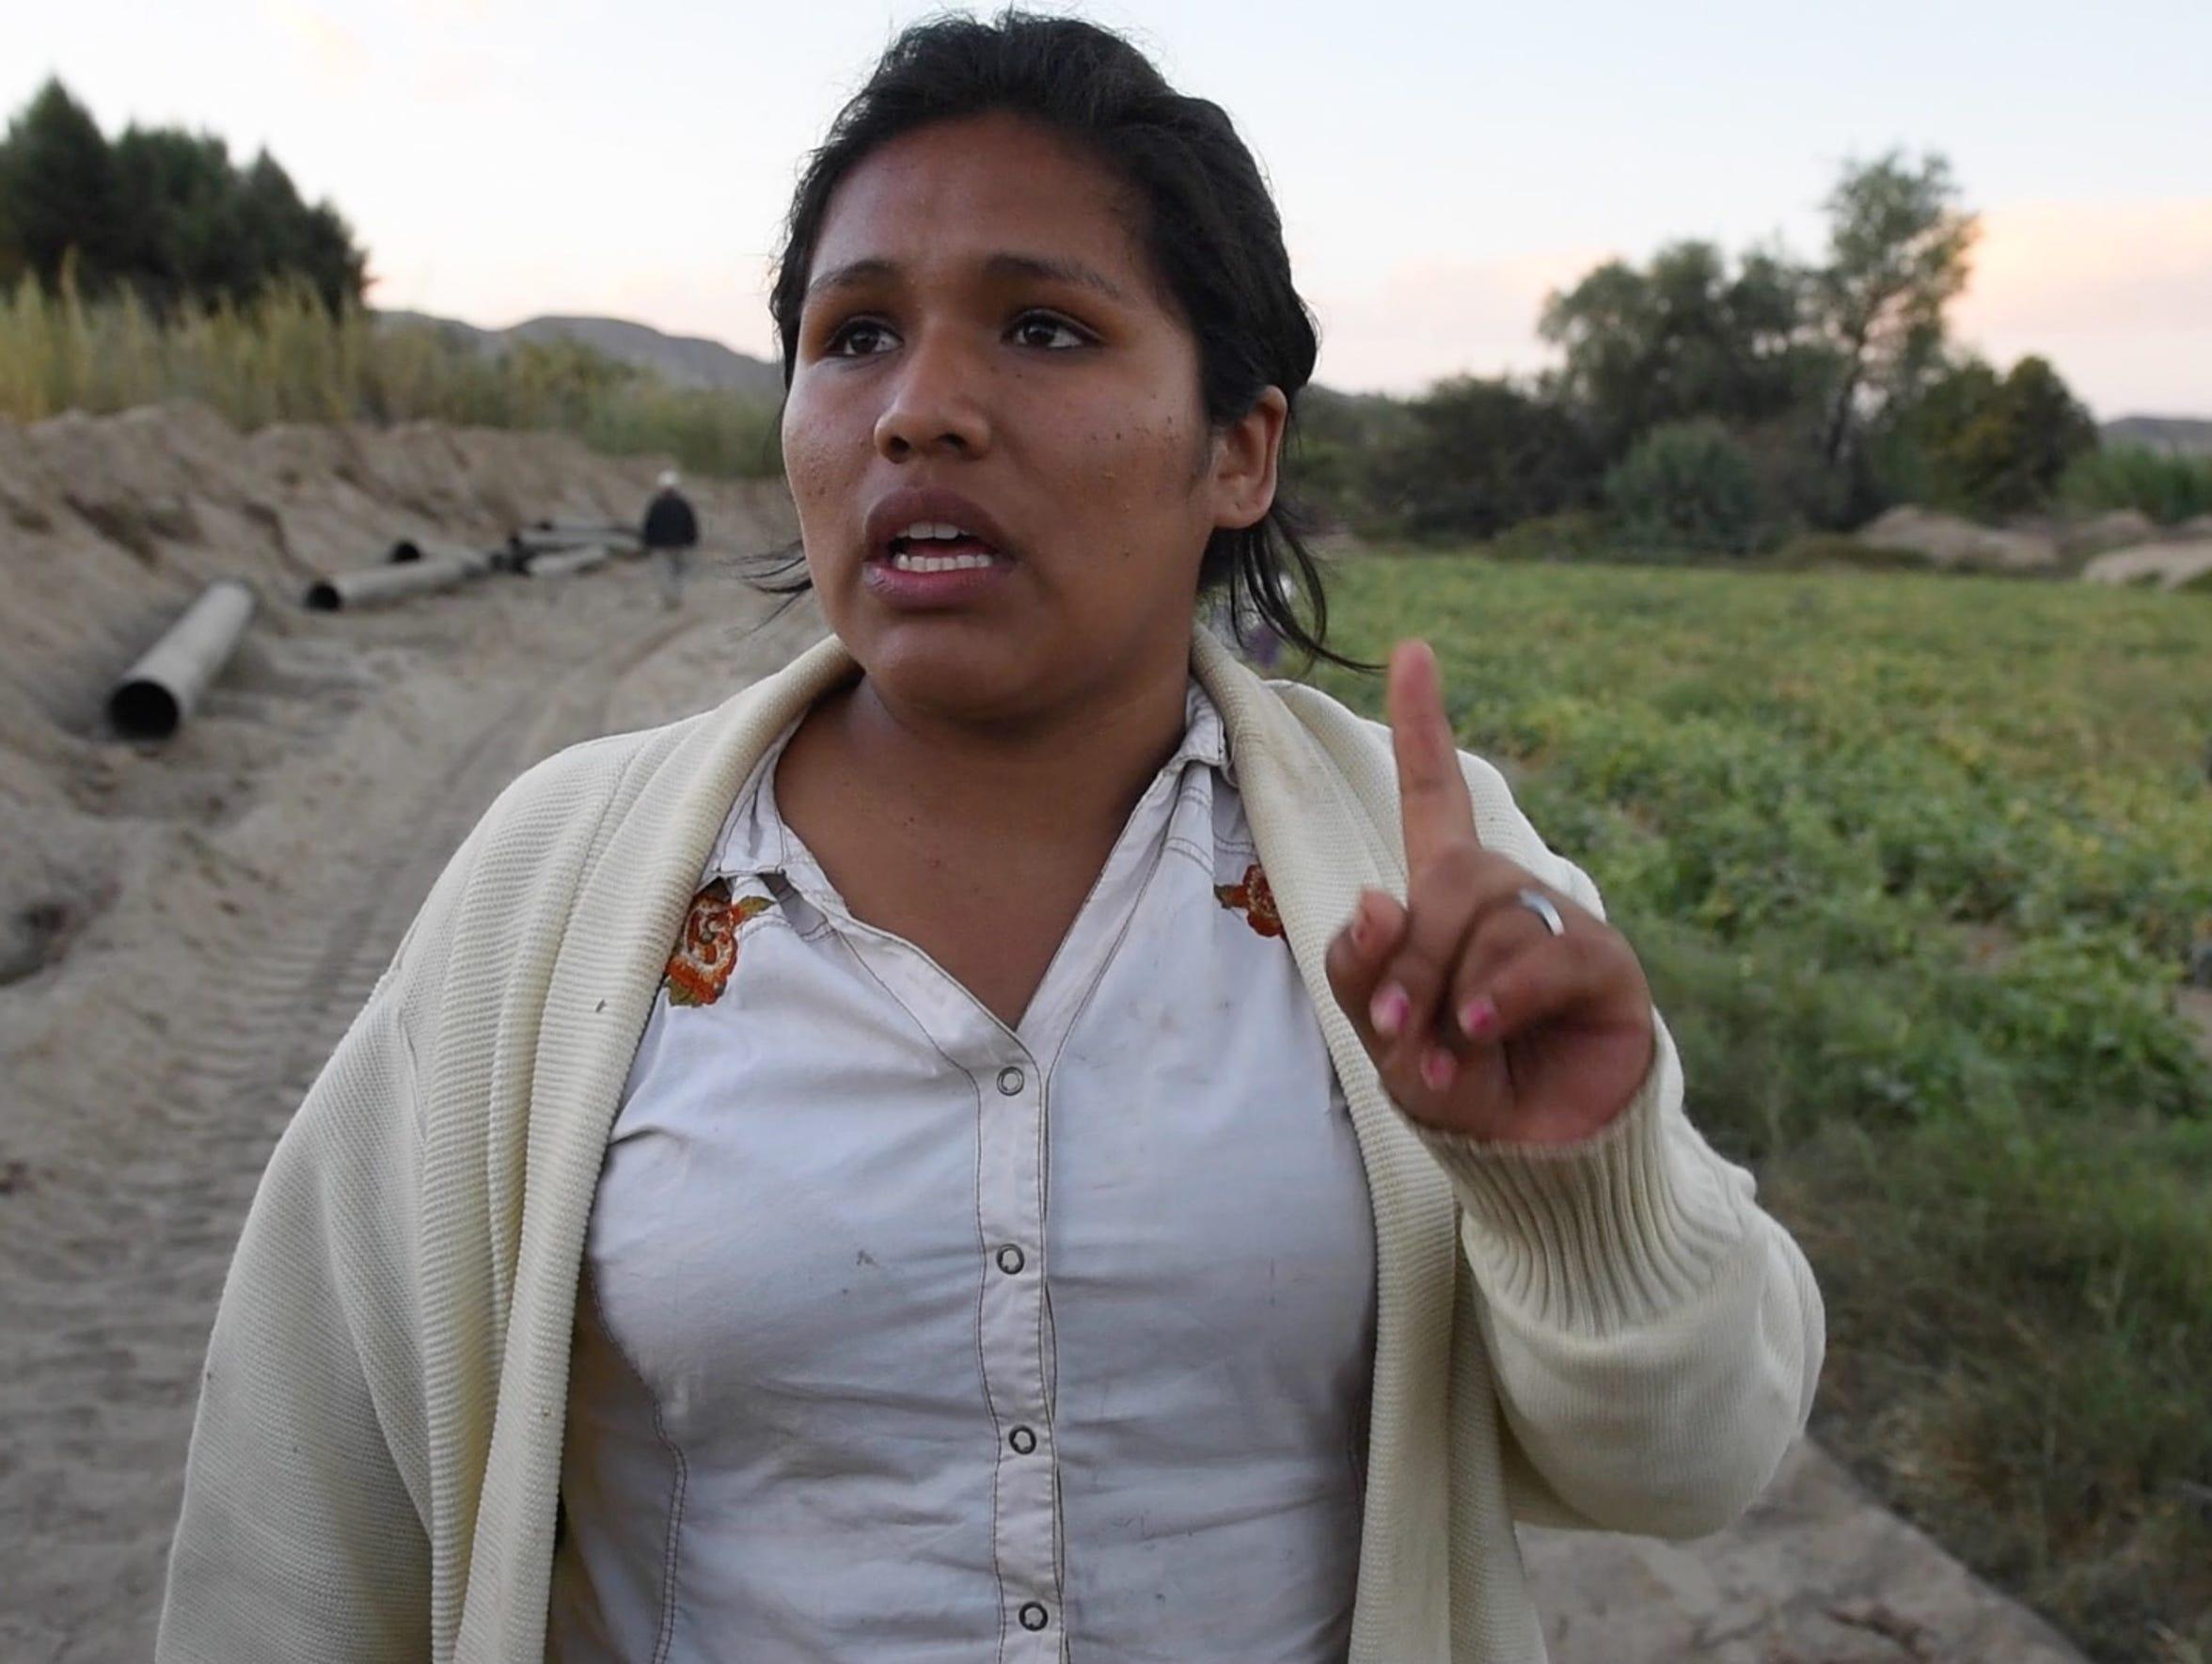 08112015 – Ocucaje, Peru -- Joselyn Guzmán, 21, has